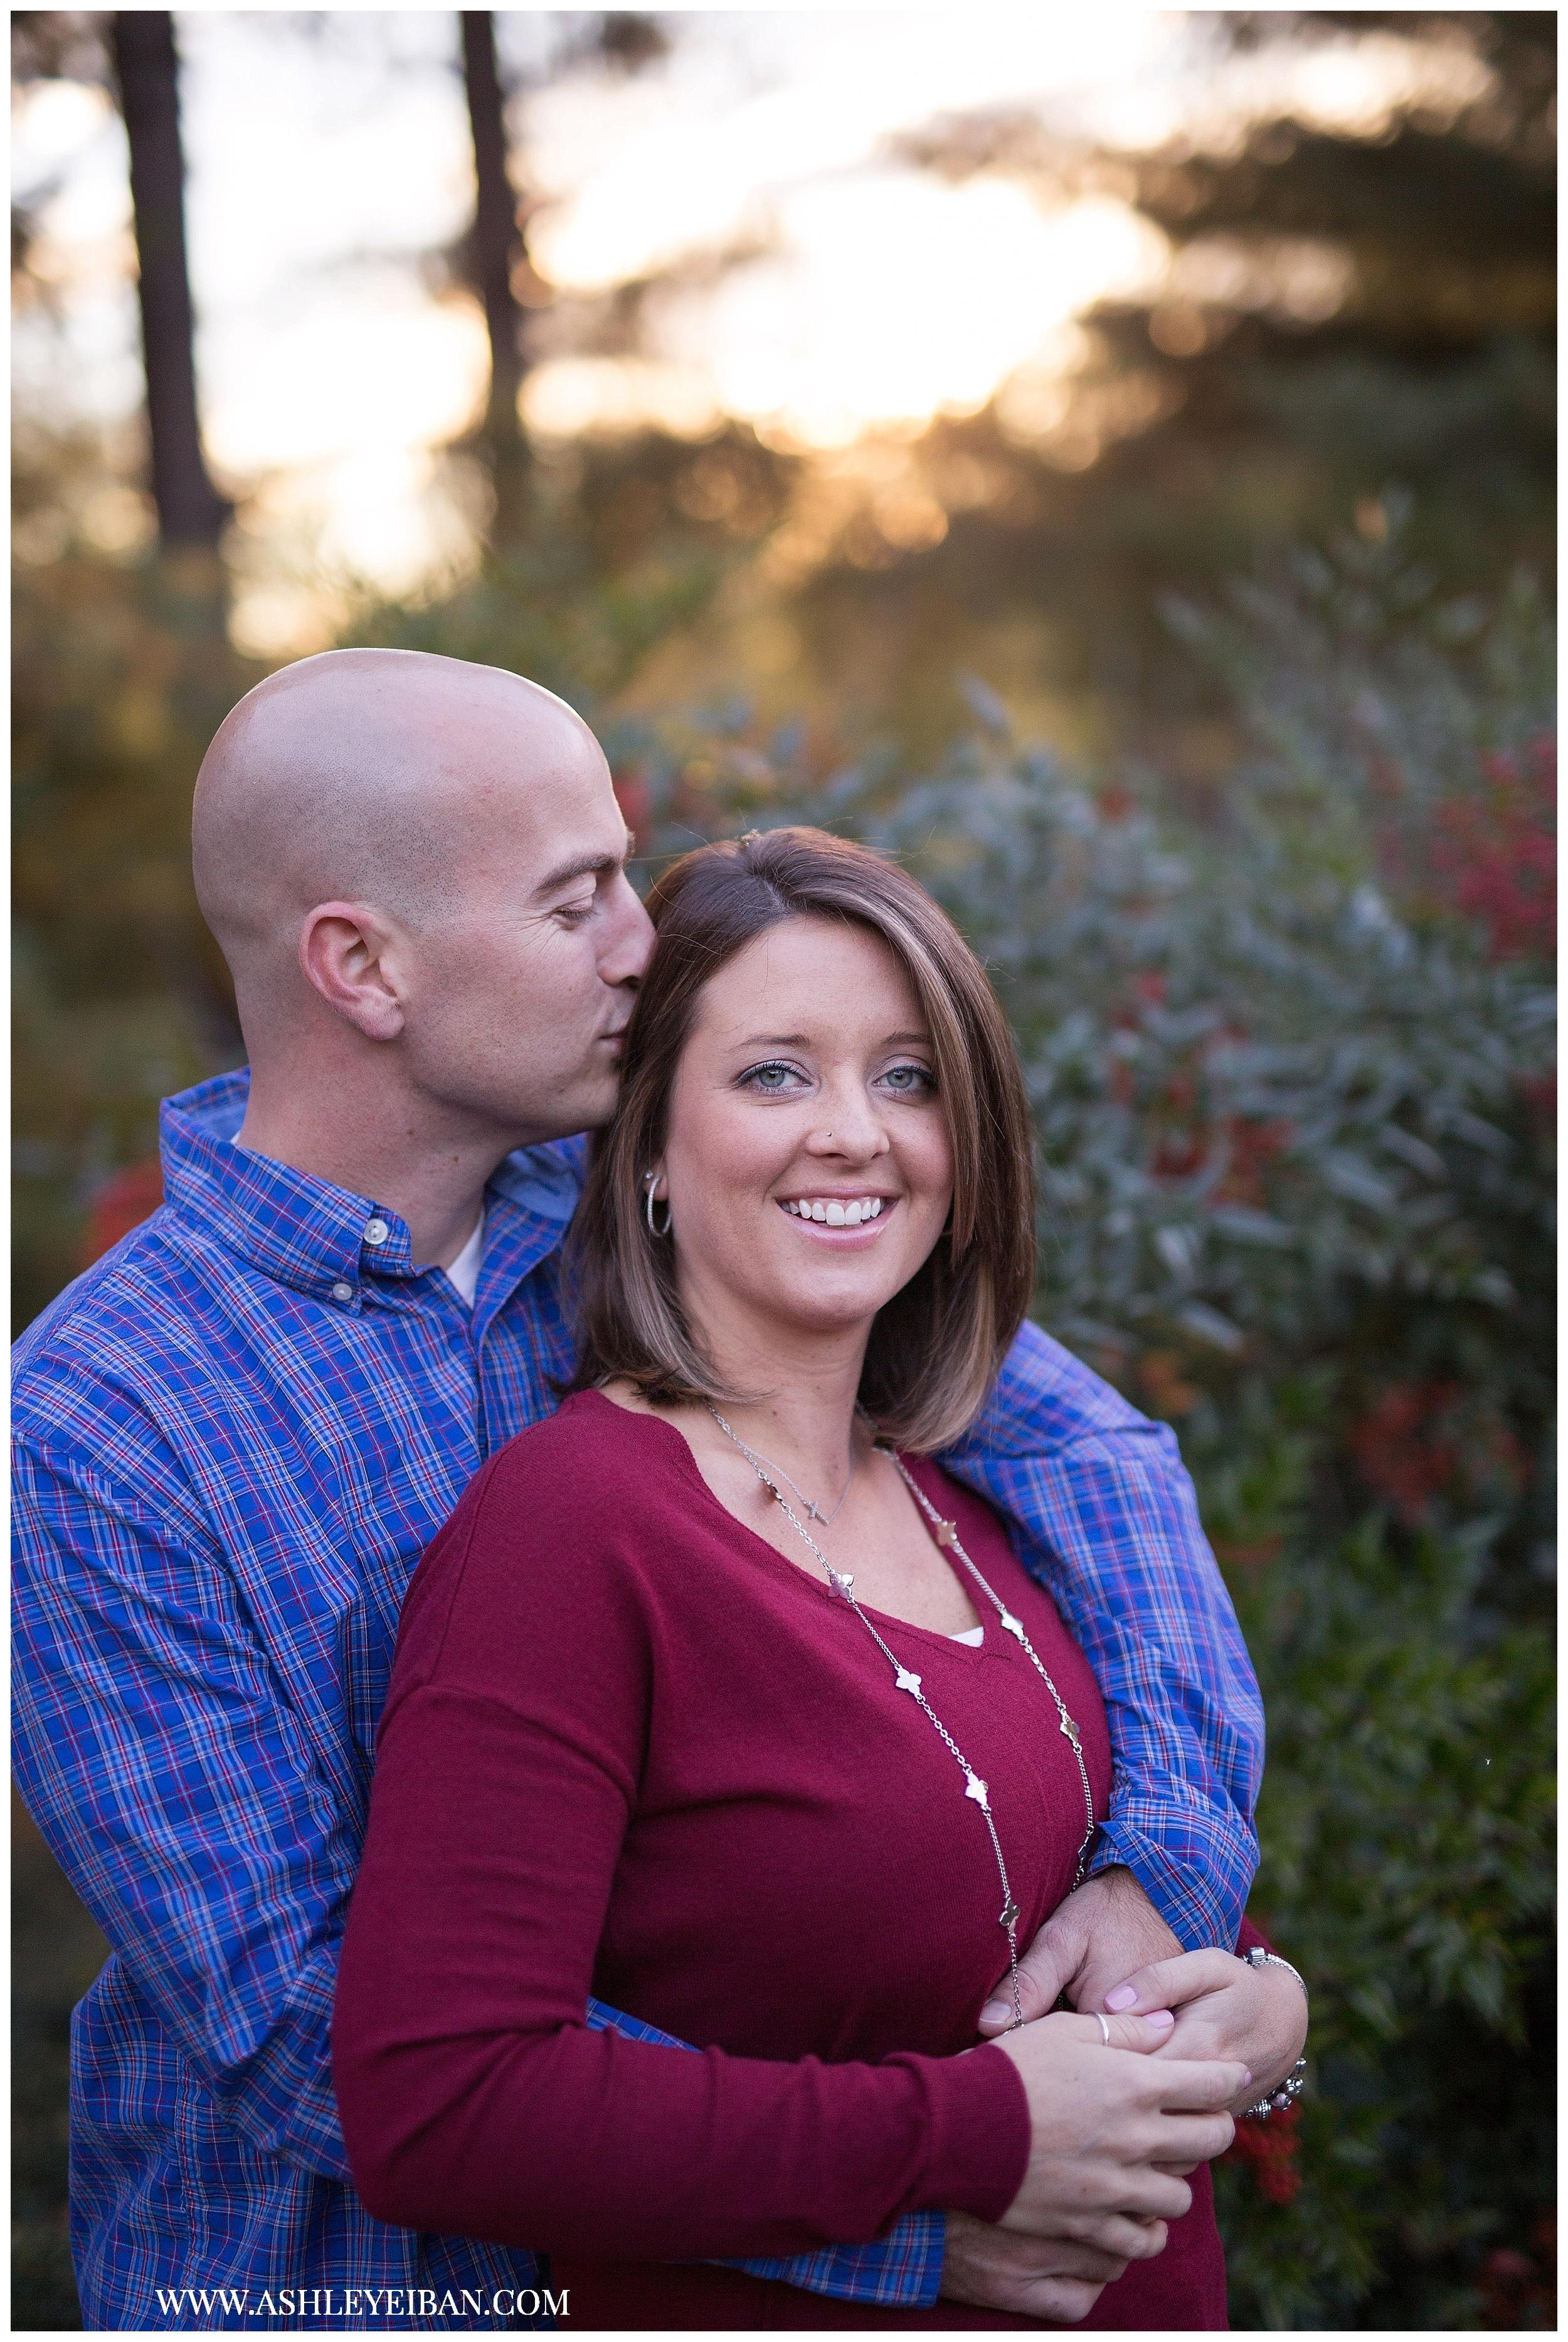 Lynchburg Virginia Family Photographer || Lynchburg VA Maternity Photographer || Ashley Eiban Photography || www.ashleyeiban.com